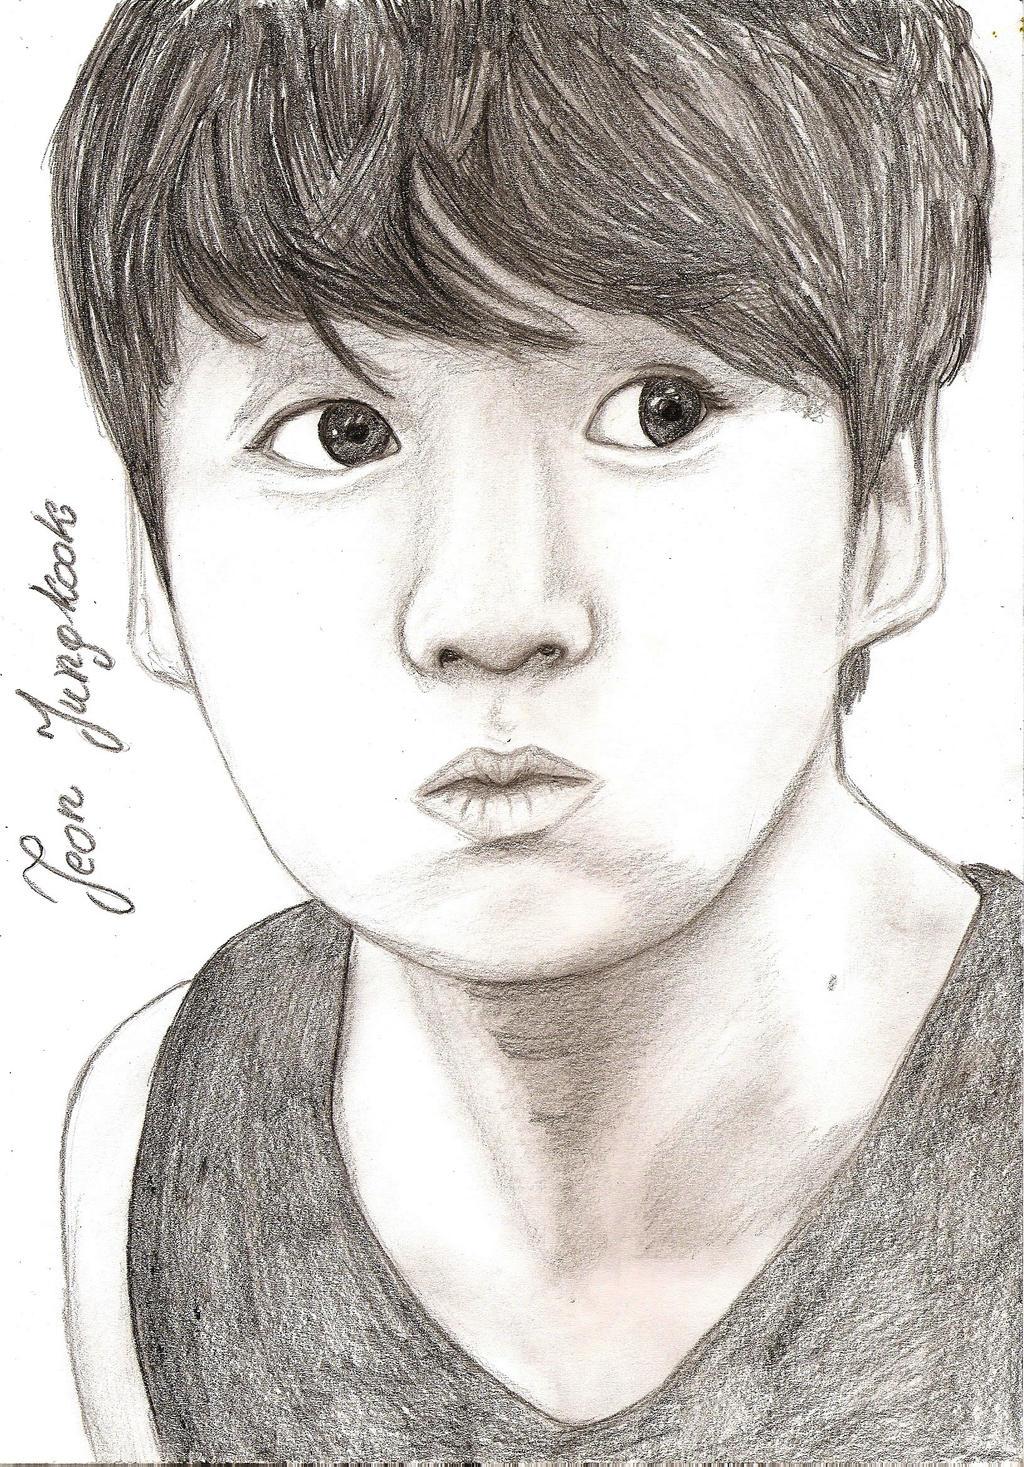 Jungkook Bts Drawings: Jeon Jungkook ~BTS By Wiwis1 On DeviantArt